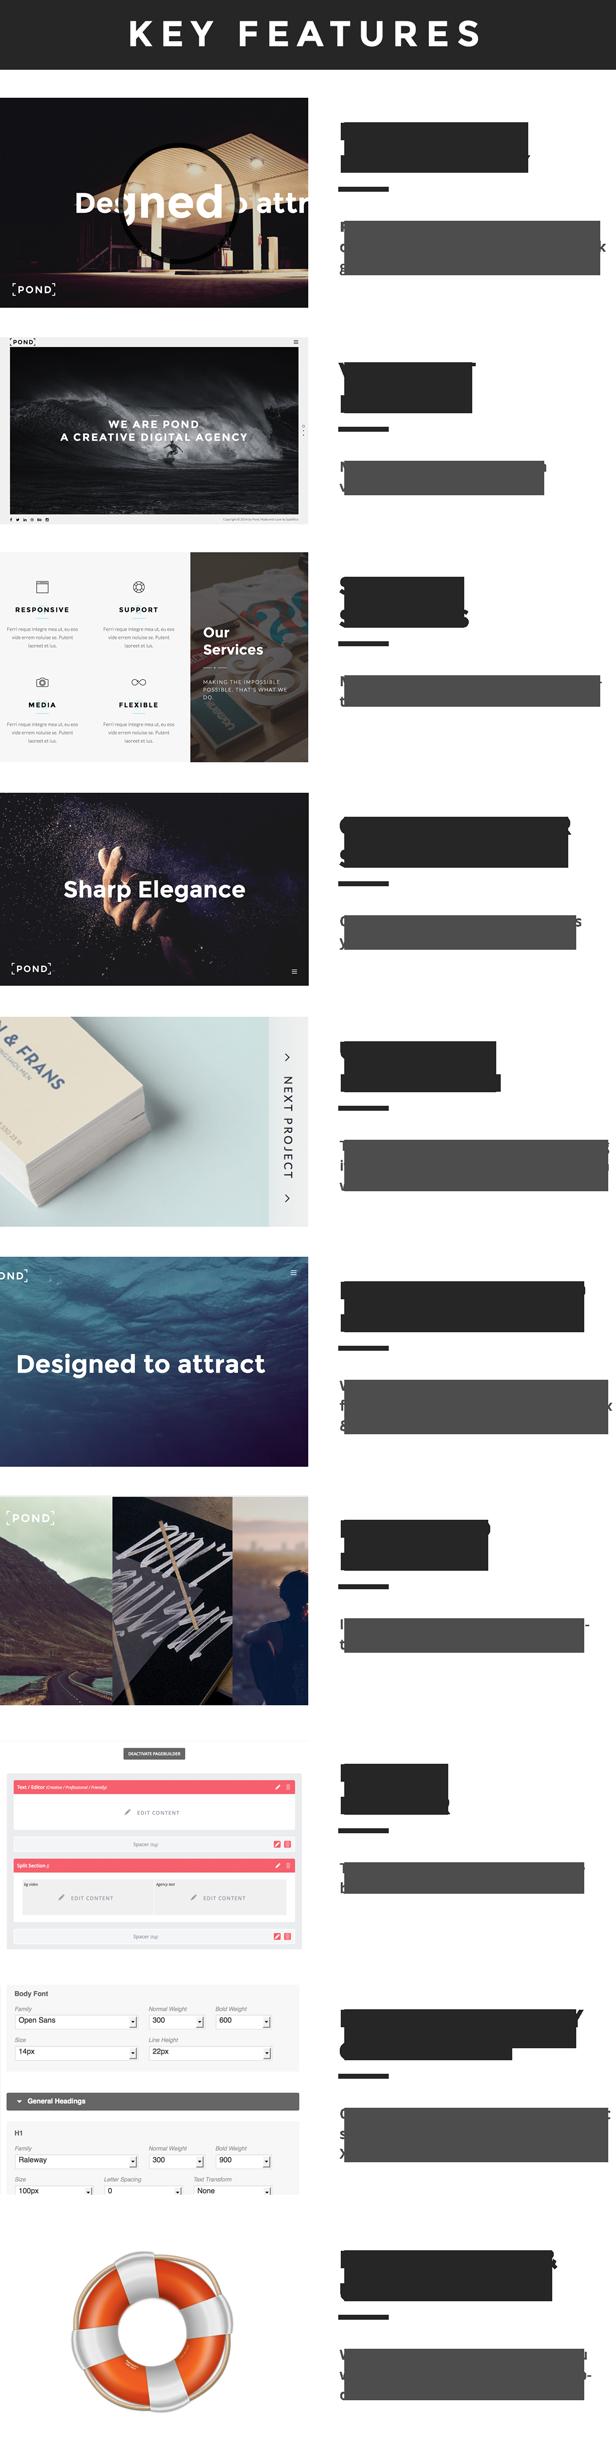 Pond - Creative Portfolio / Agency WordPress Theme - 6